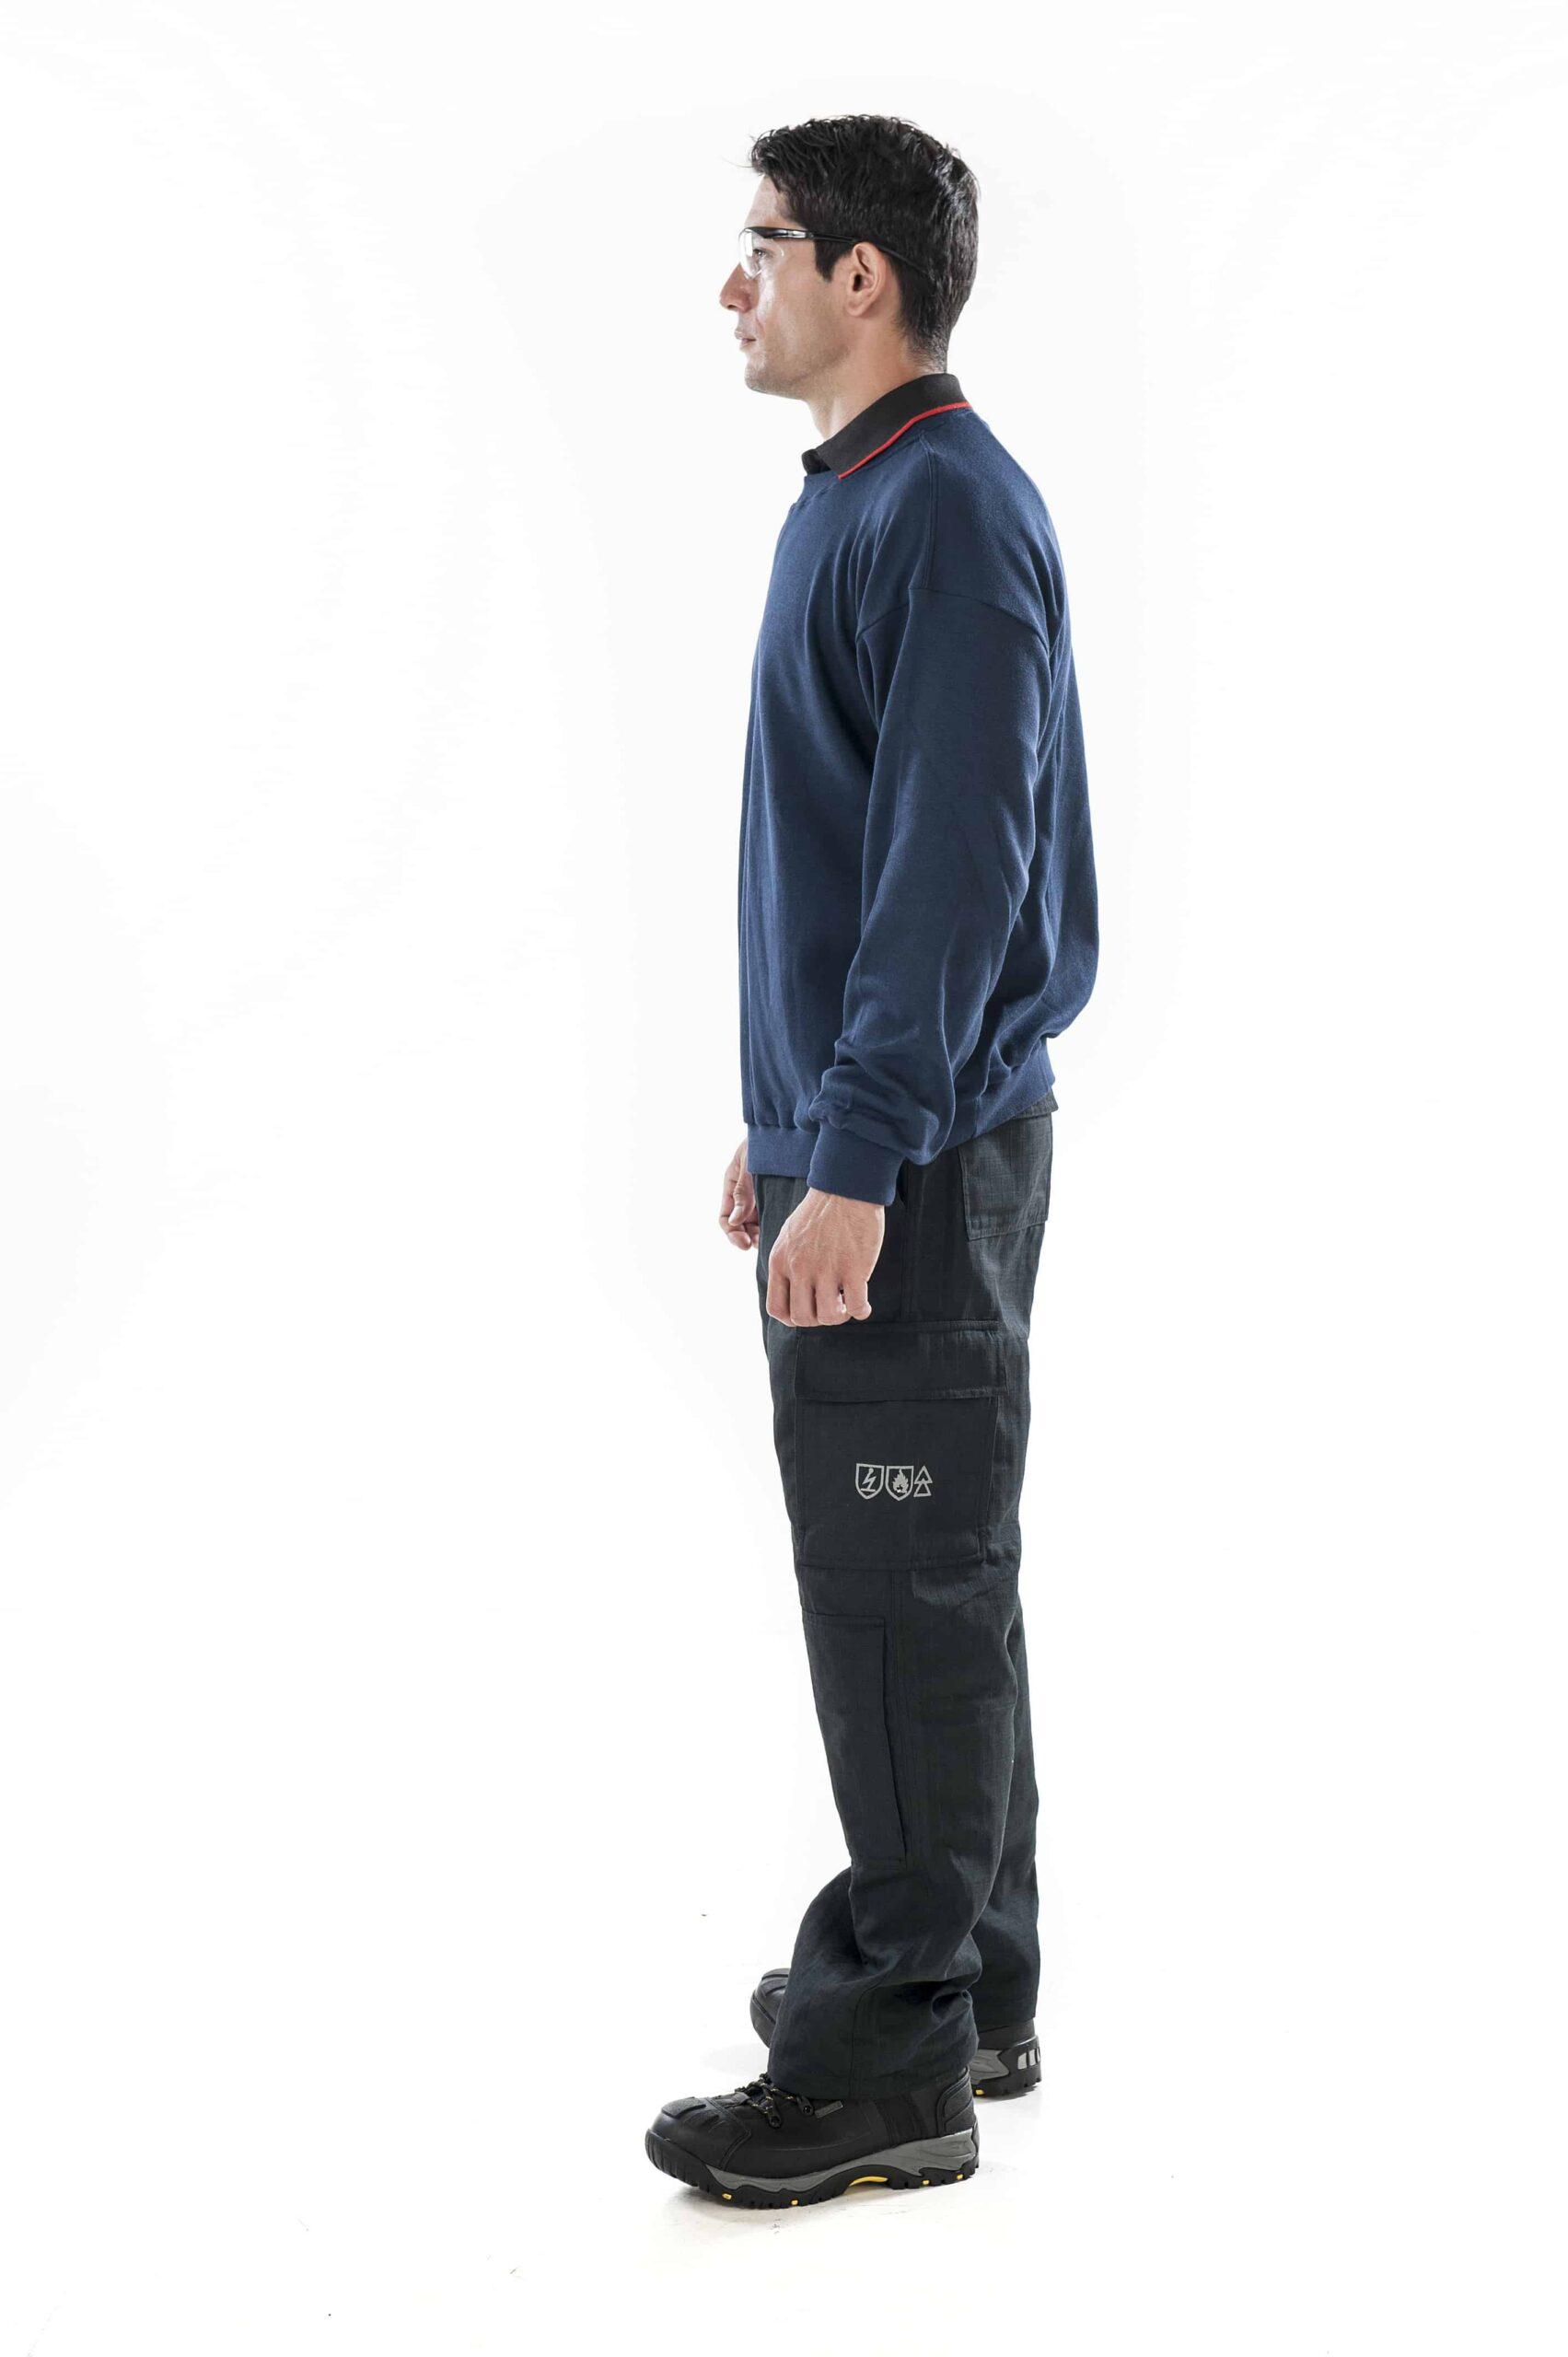 ArcBan® Blue Sweatshirt left side